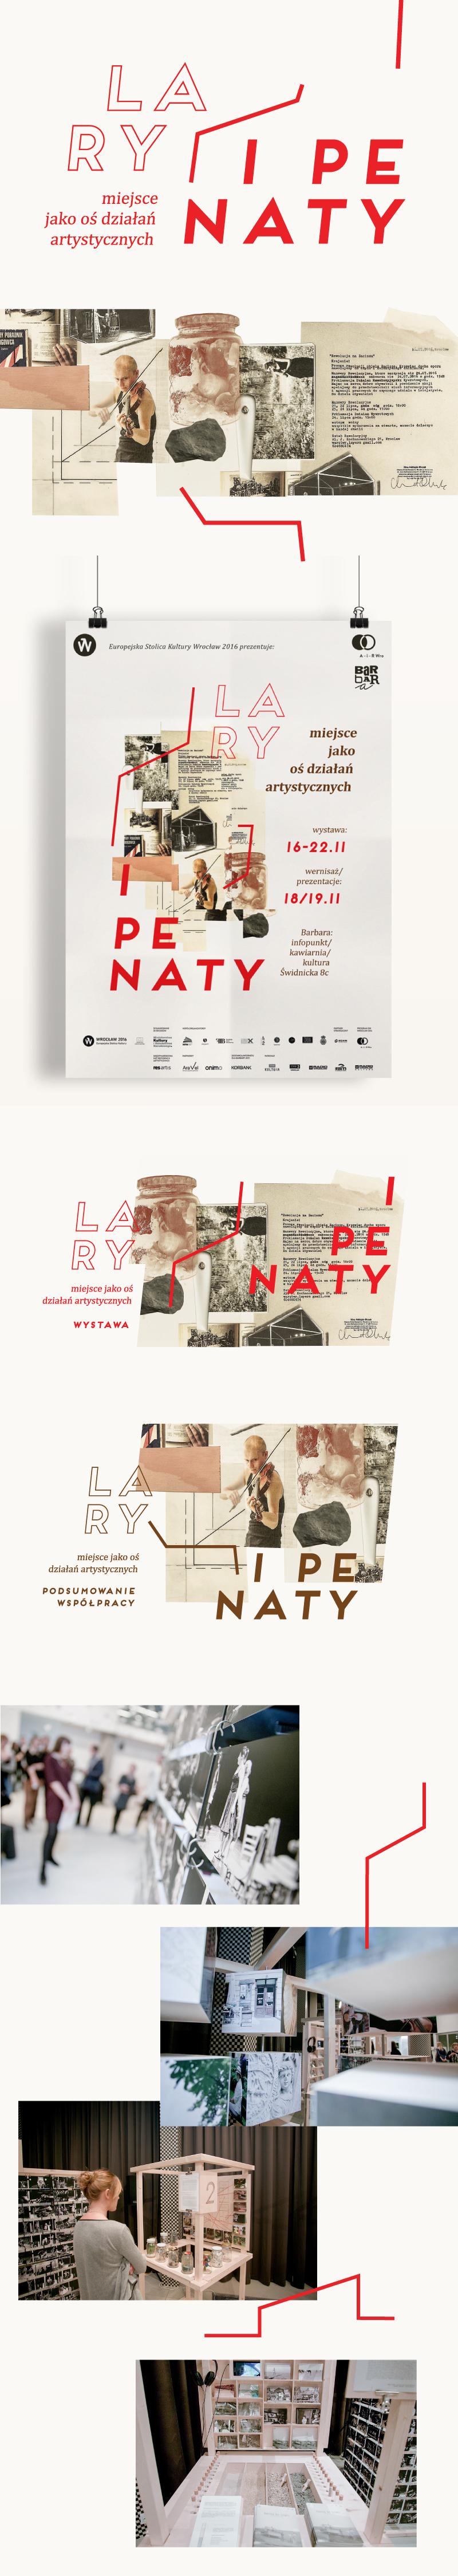 lary-web